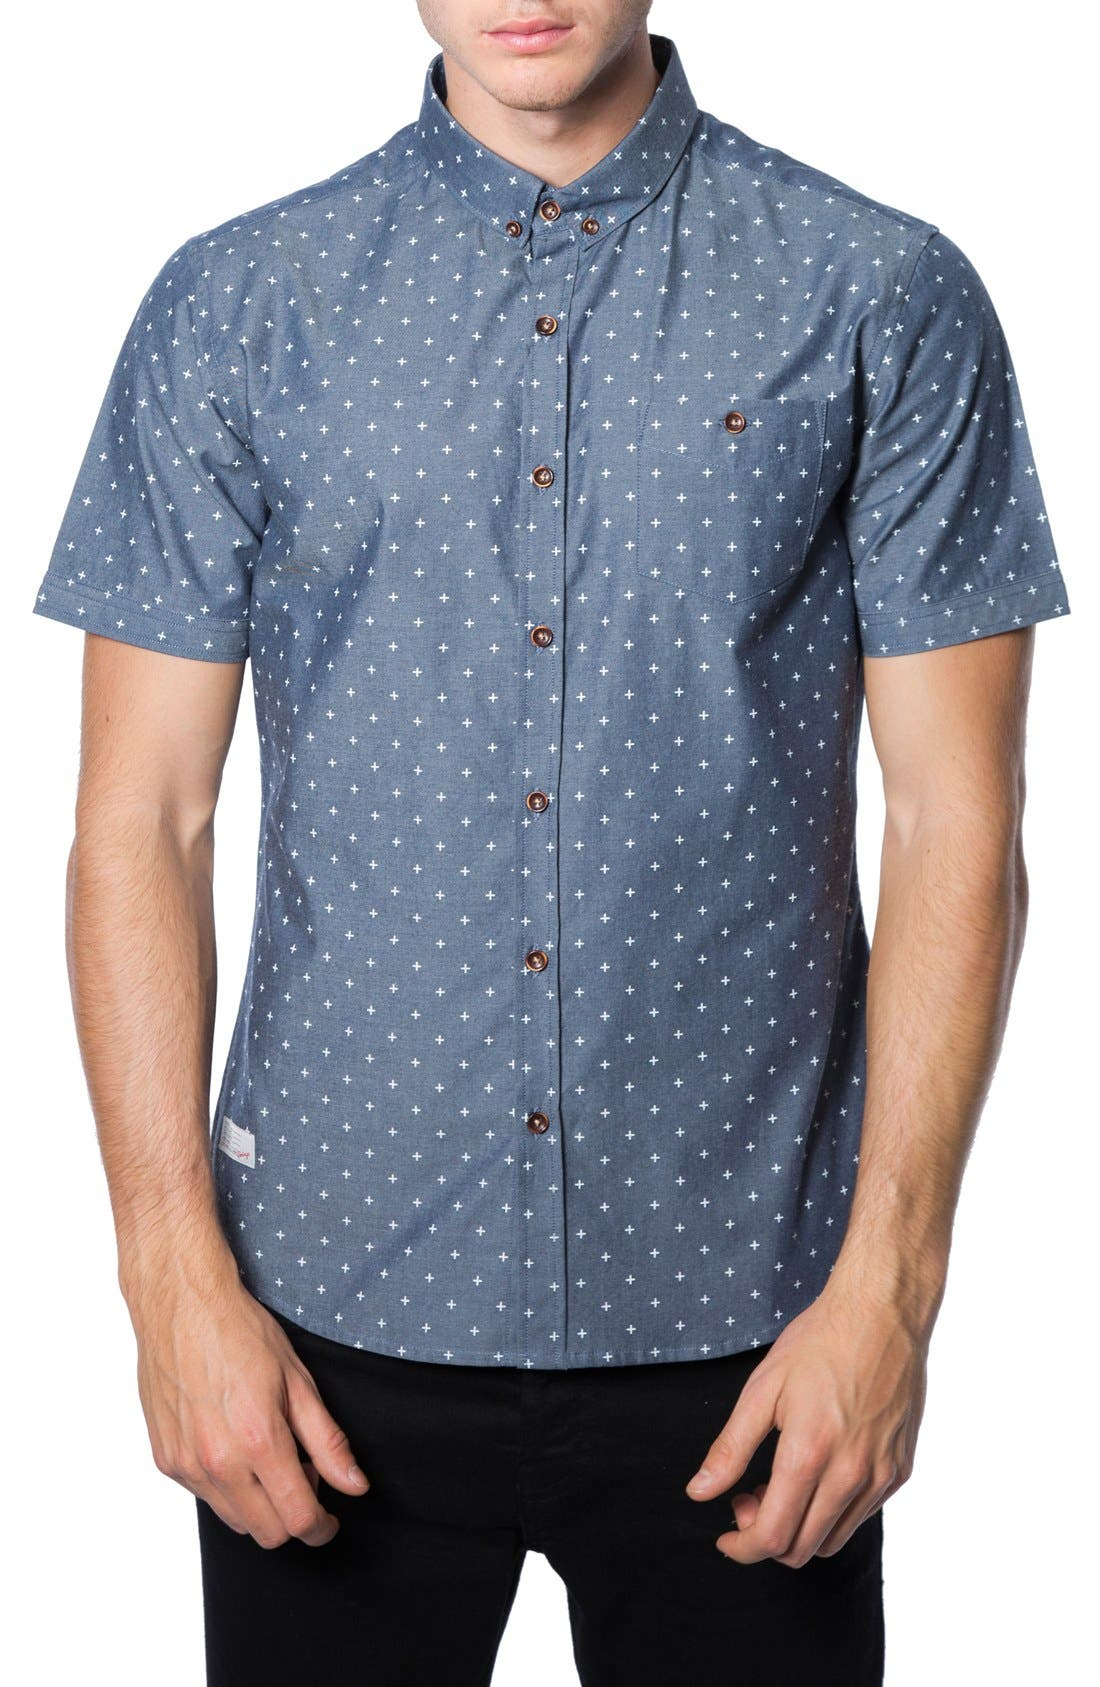 'Habits' Trim Fit Short Sleeve Chambray Shirt, Main, color, 410